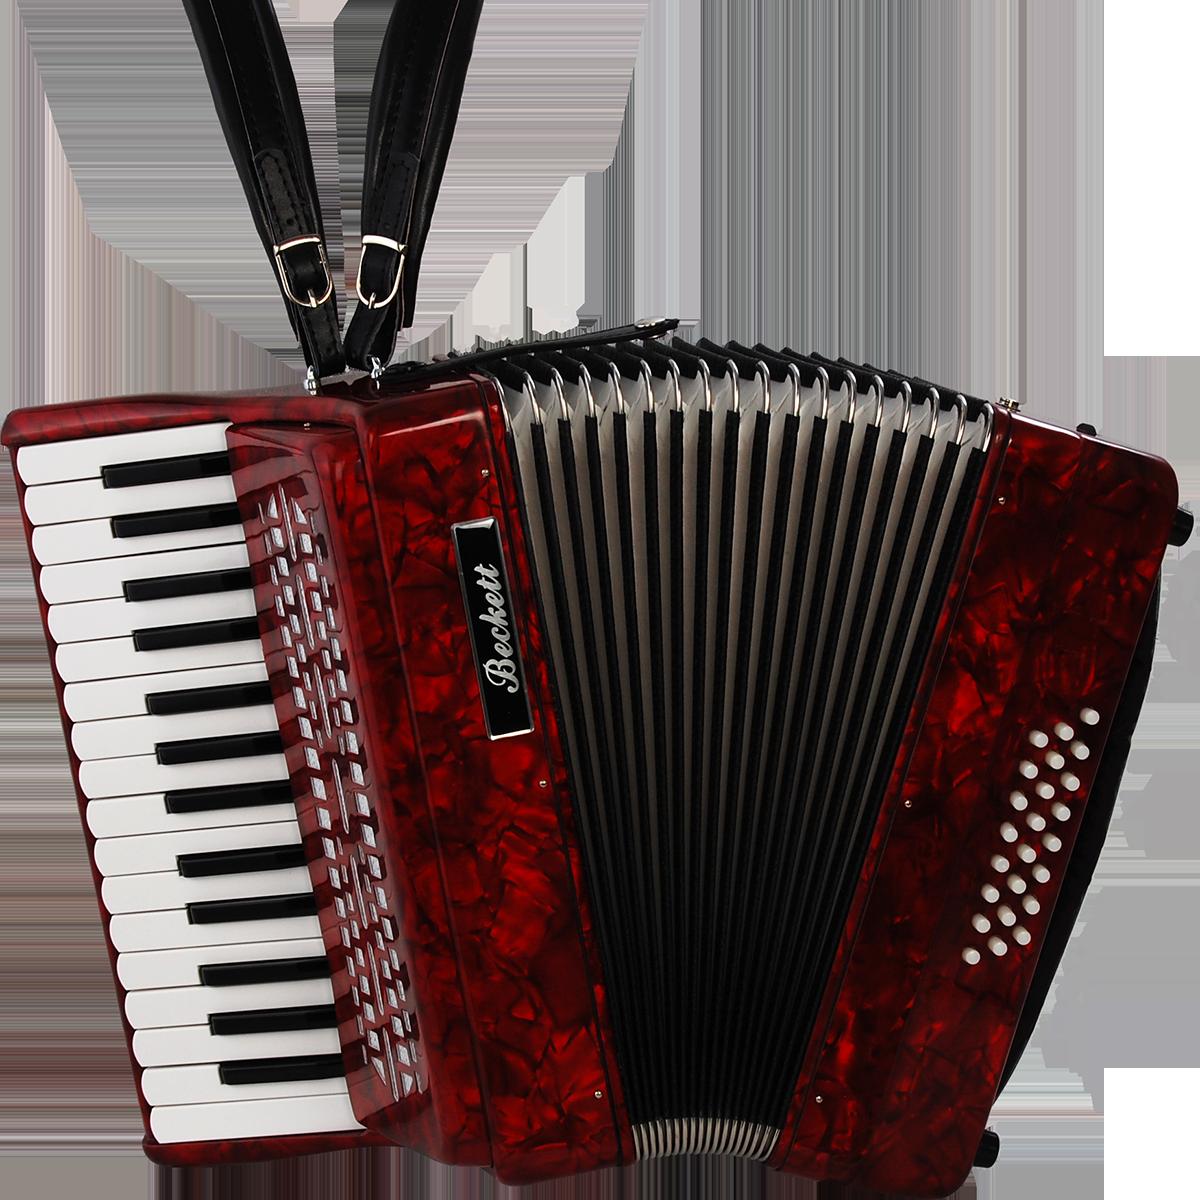 Billede af Beckett JH2024 piano-harmonika rød